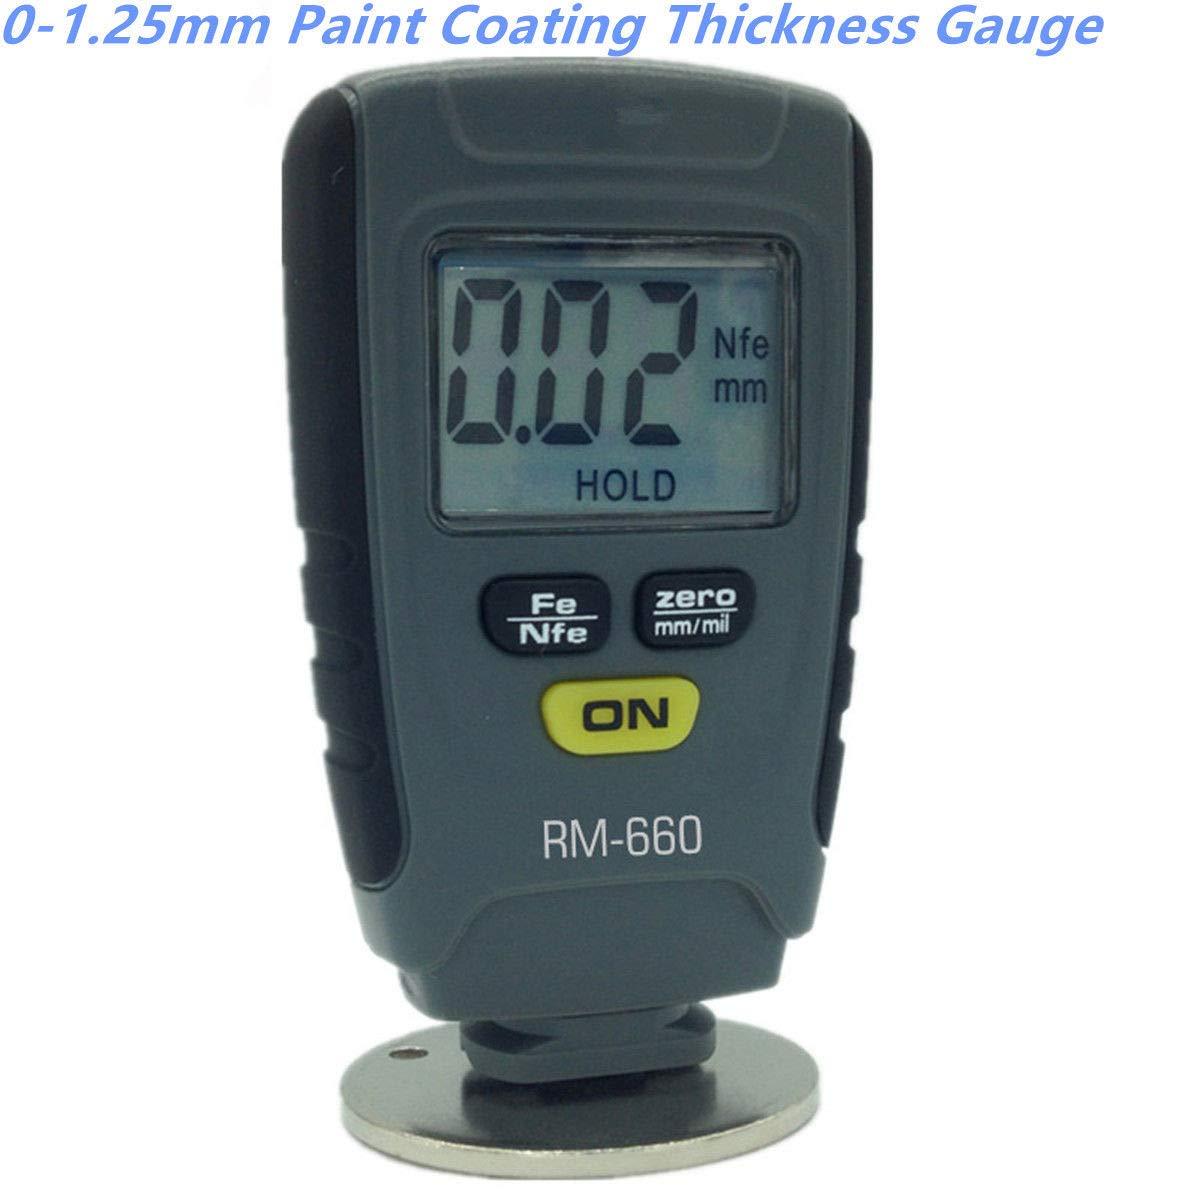 FidgetFidget Precision Paint Coating Thickness Gauge Meter Tester 0-1.25mm Base Iron Aluminum